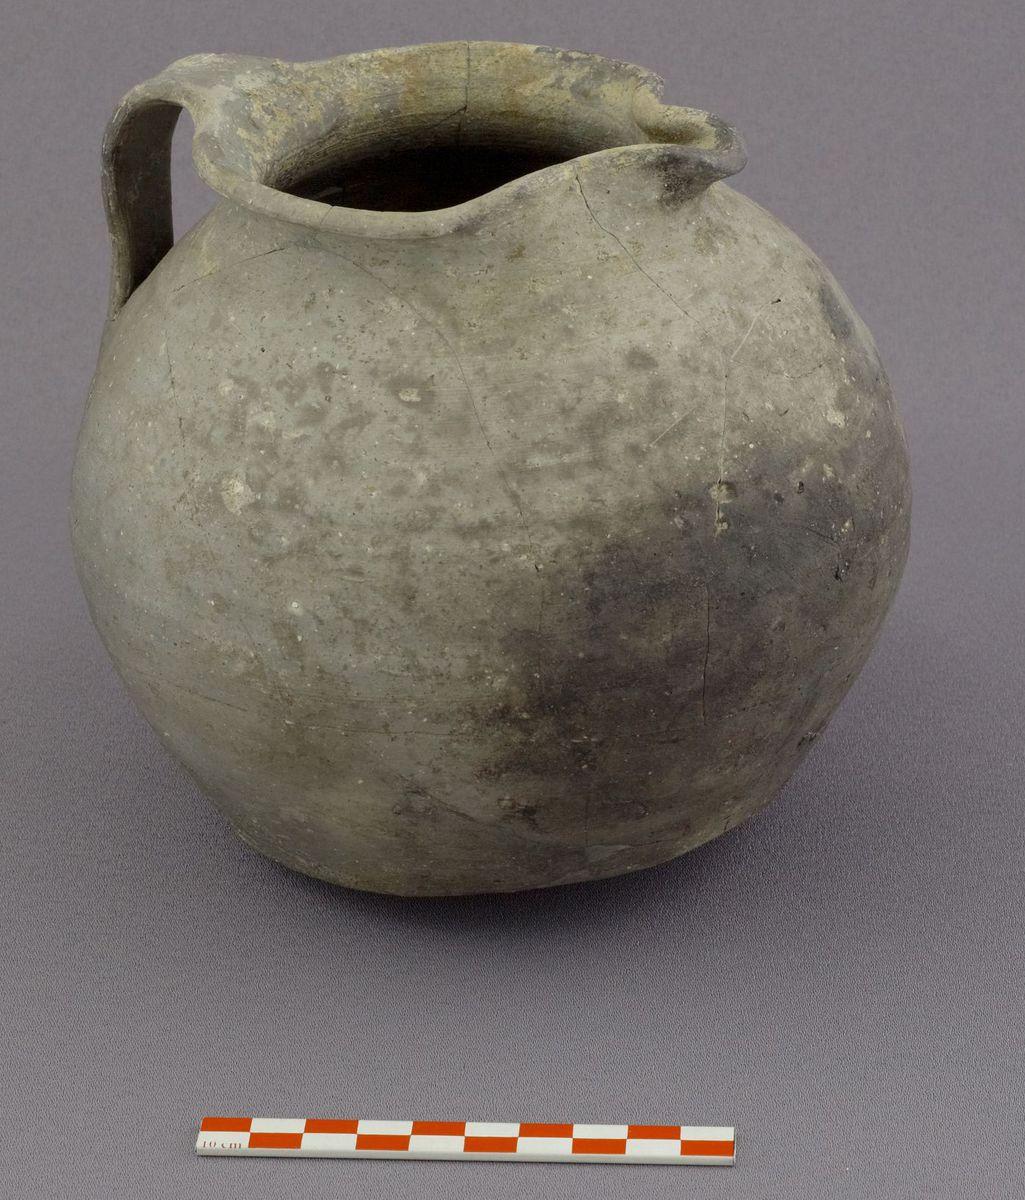 archéologie ; céramique 11e siècle 12e-13e siècle